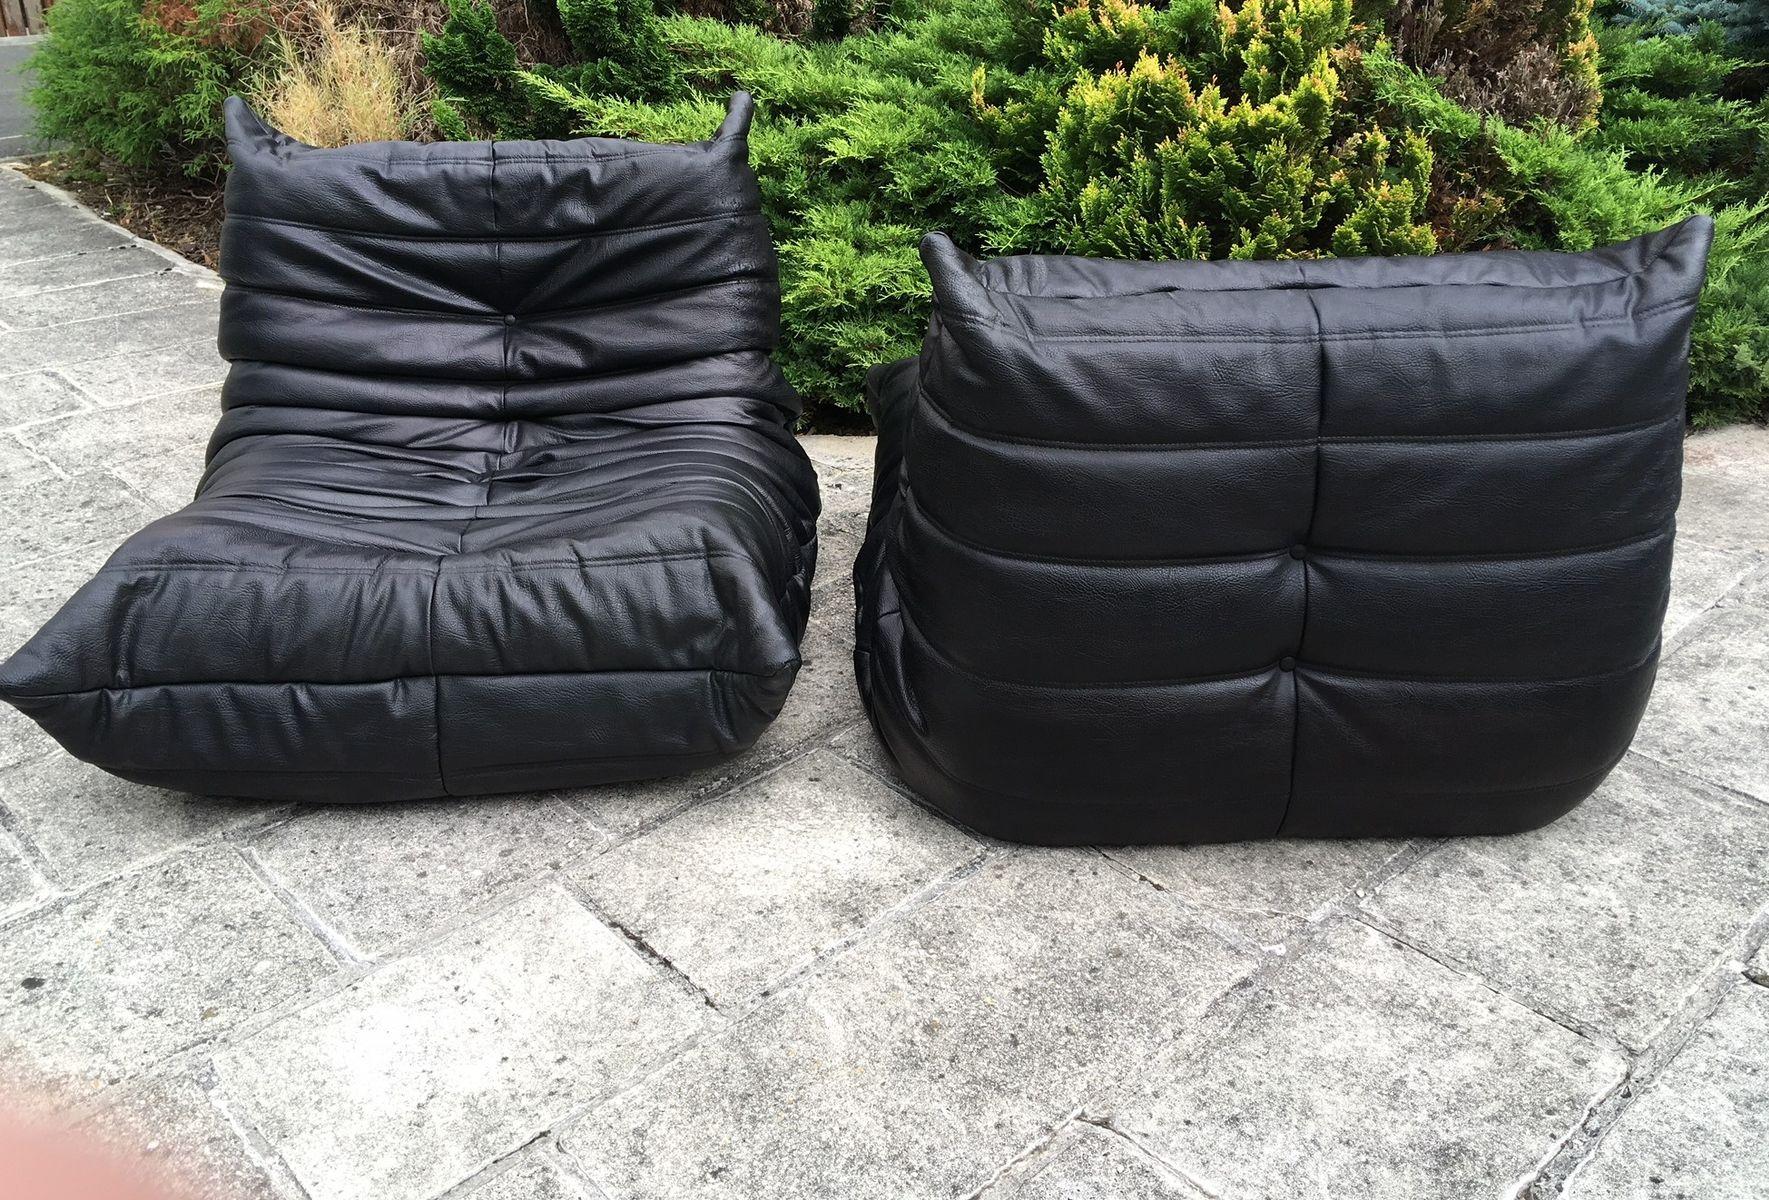 schwarze vintage togo sessel von michel ducaroy f r ligne roset 2er set bei pamono kaufen. Black Bedroom Furniture Sets. Home Design Ideas